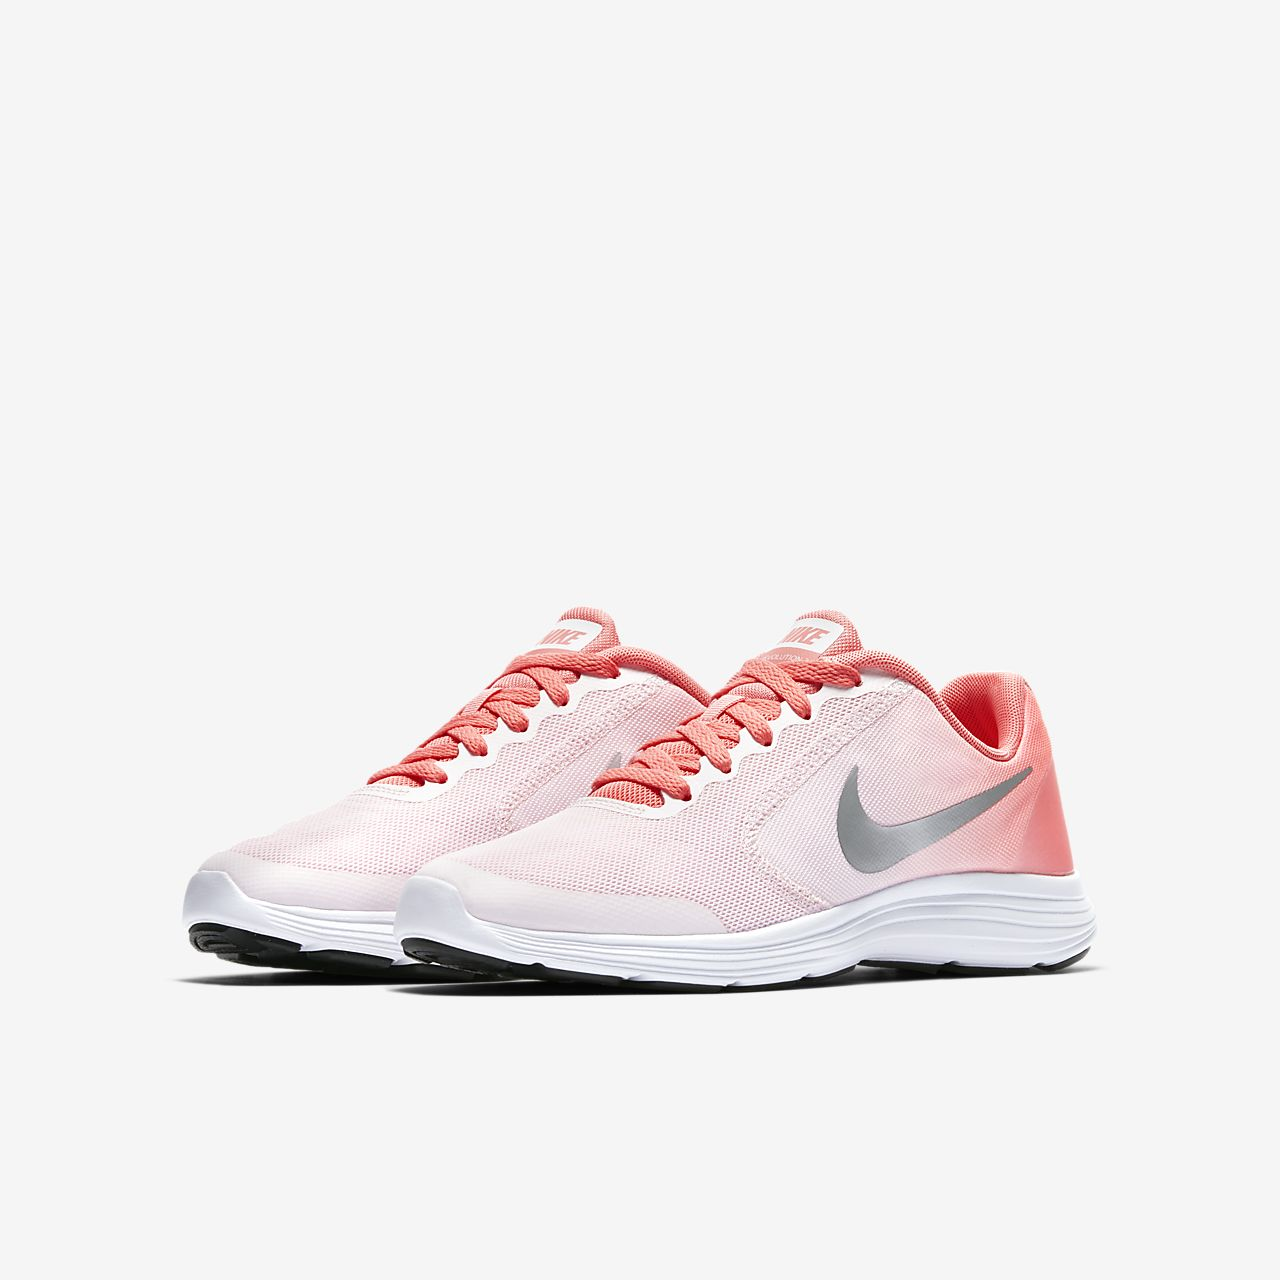 bbafd70973 Nike Revolution 3 Older Kids' Running Shoe. Nike.com CA